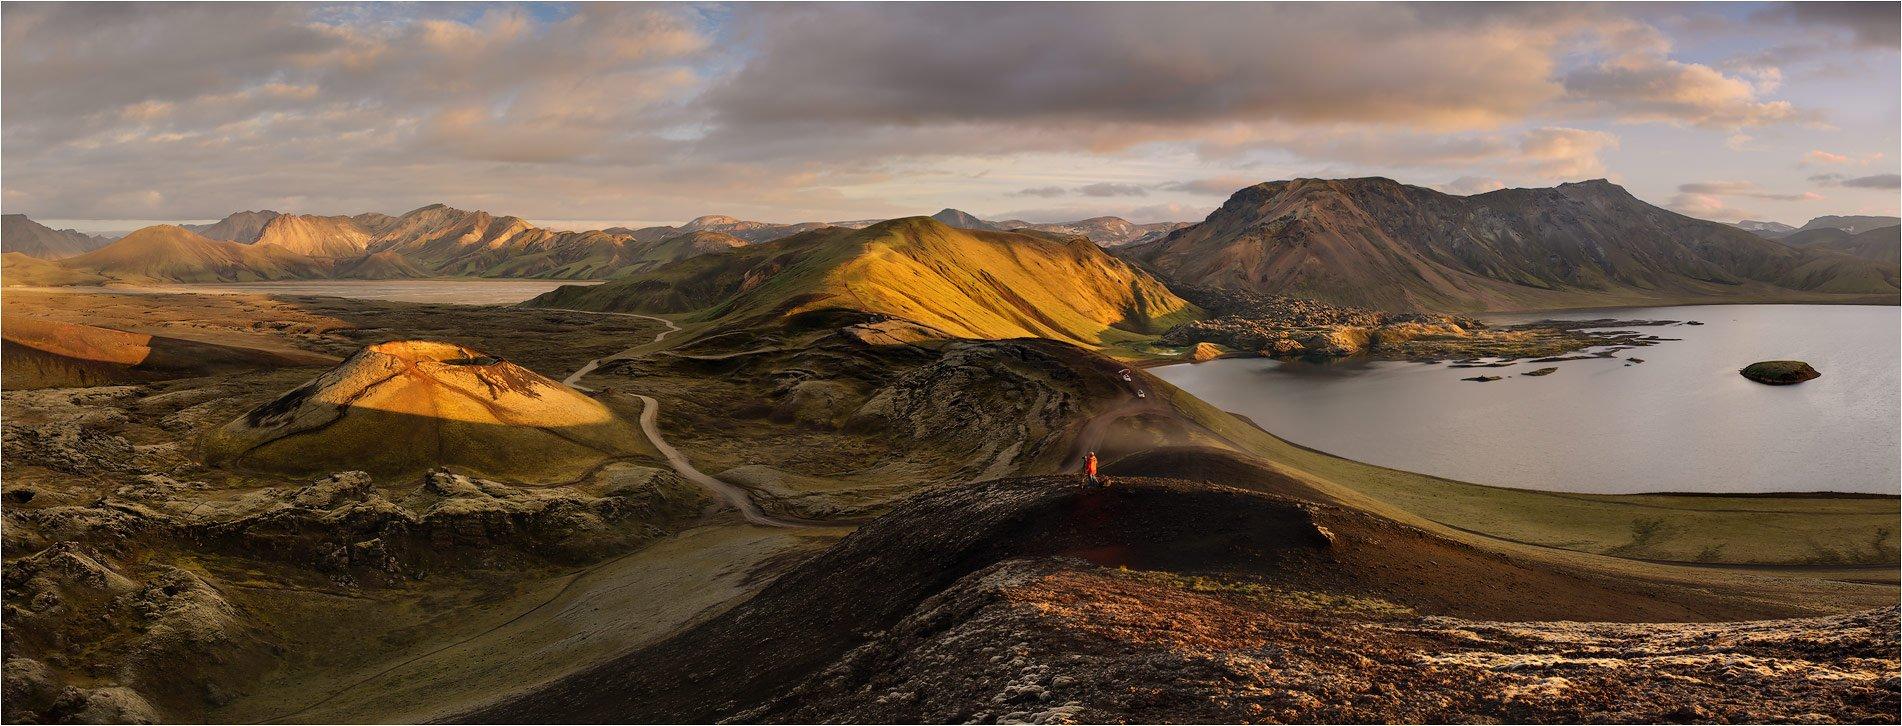 исландия, iceland, Yury Pustovoy